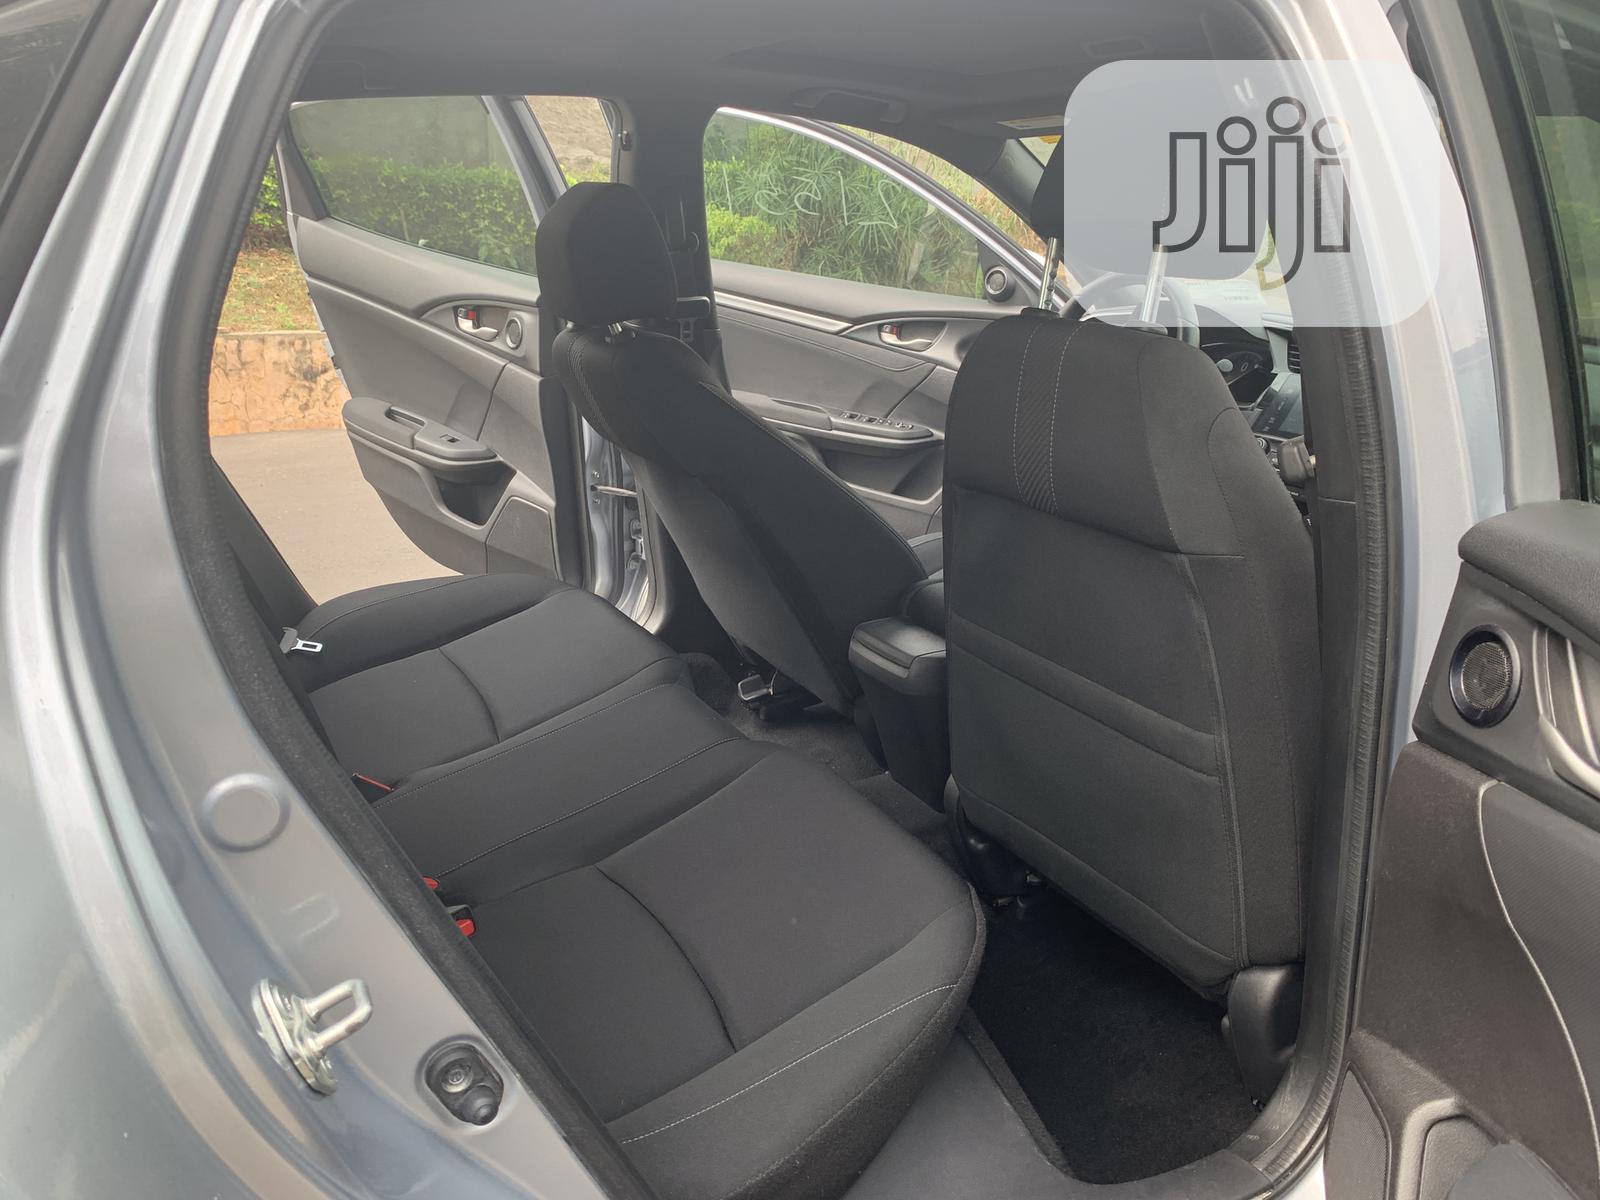 Honda Civic 2018 EX Hatchback Silver | Cars for sale in Ikeja, Lagos State, Nigeria